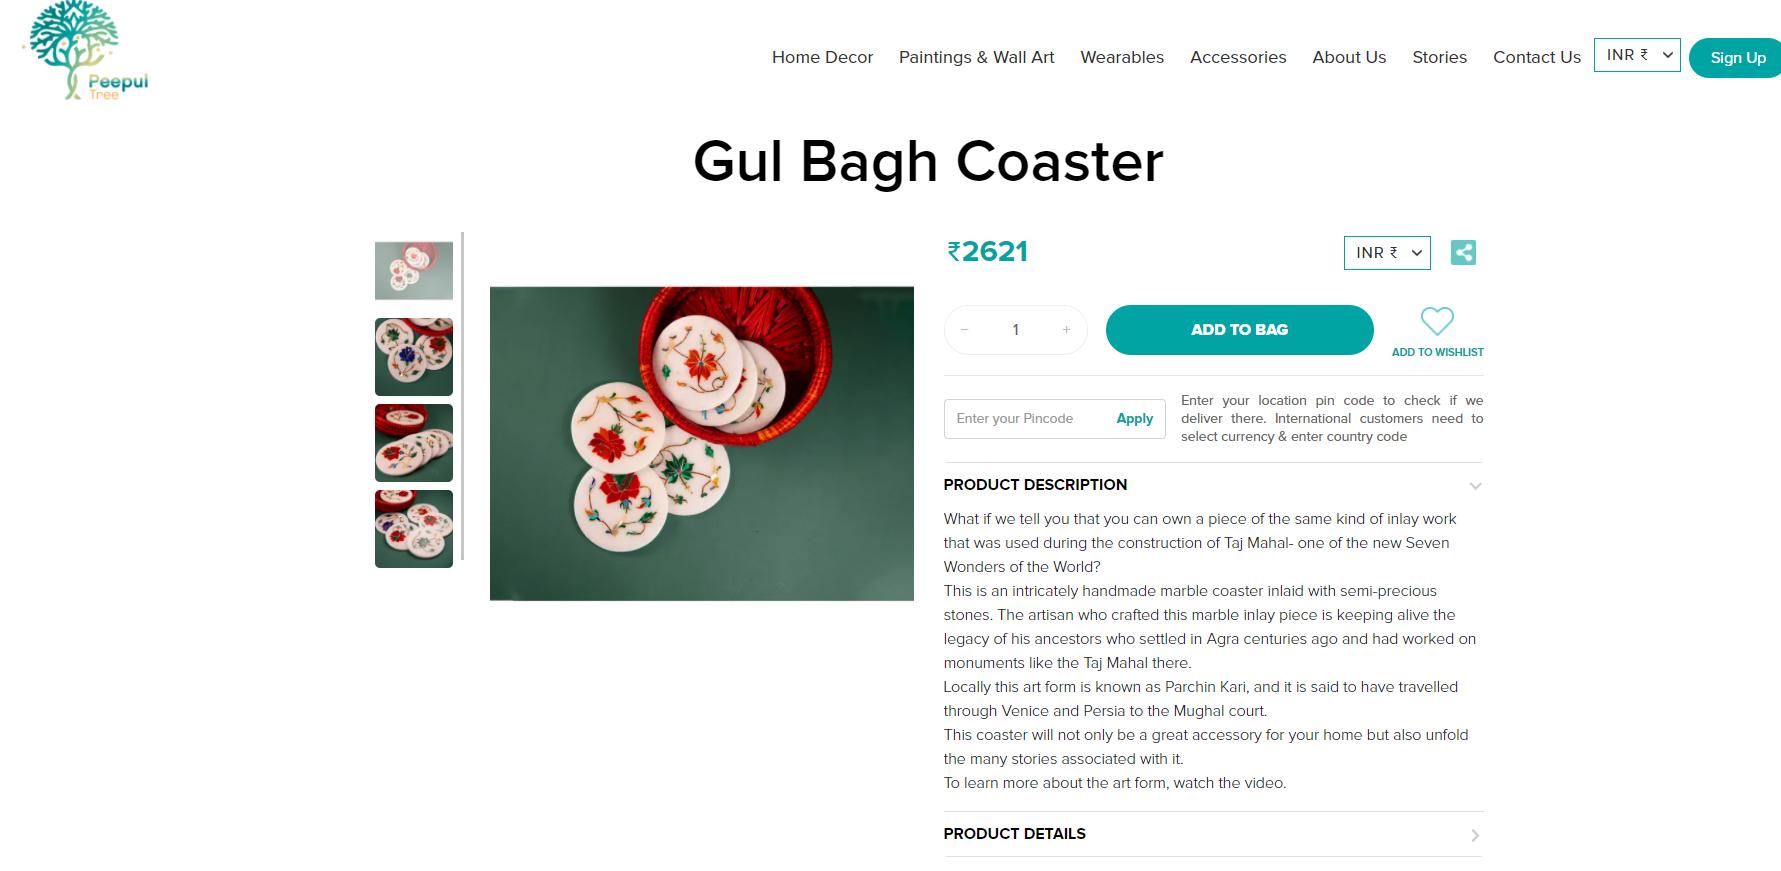 Marble Inlay Coasters from Agra at Peepul Tree